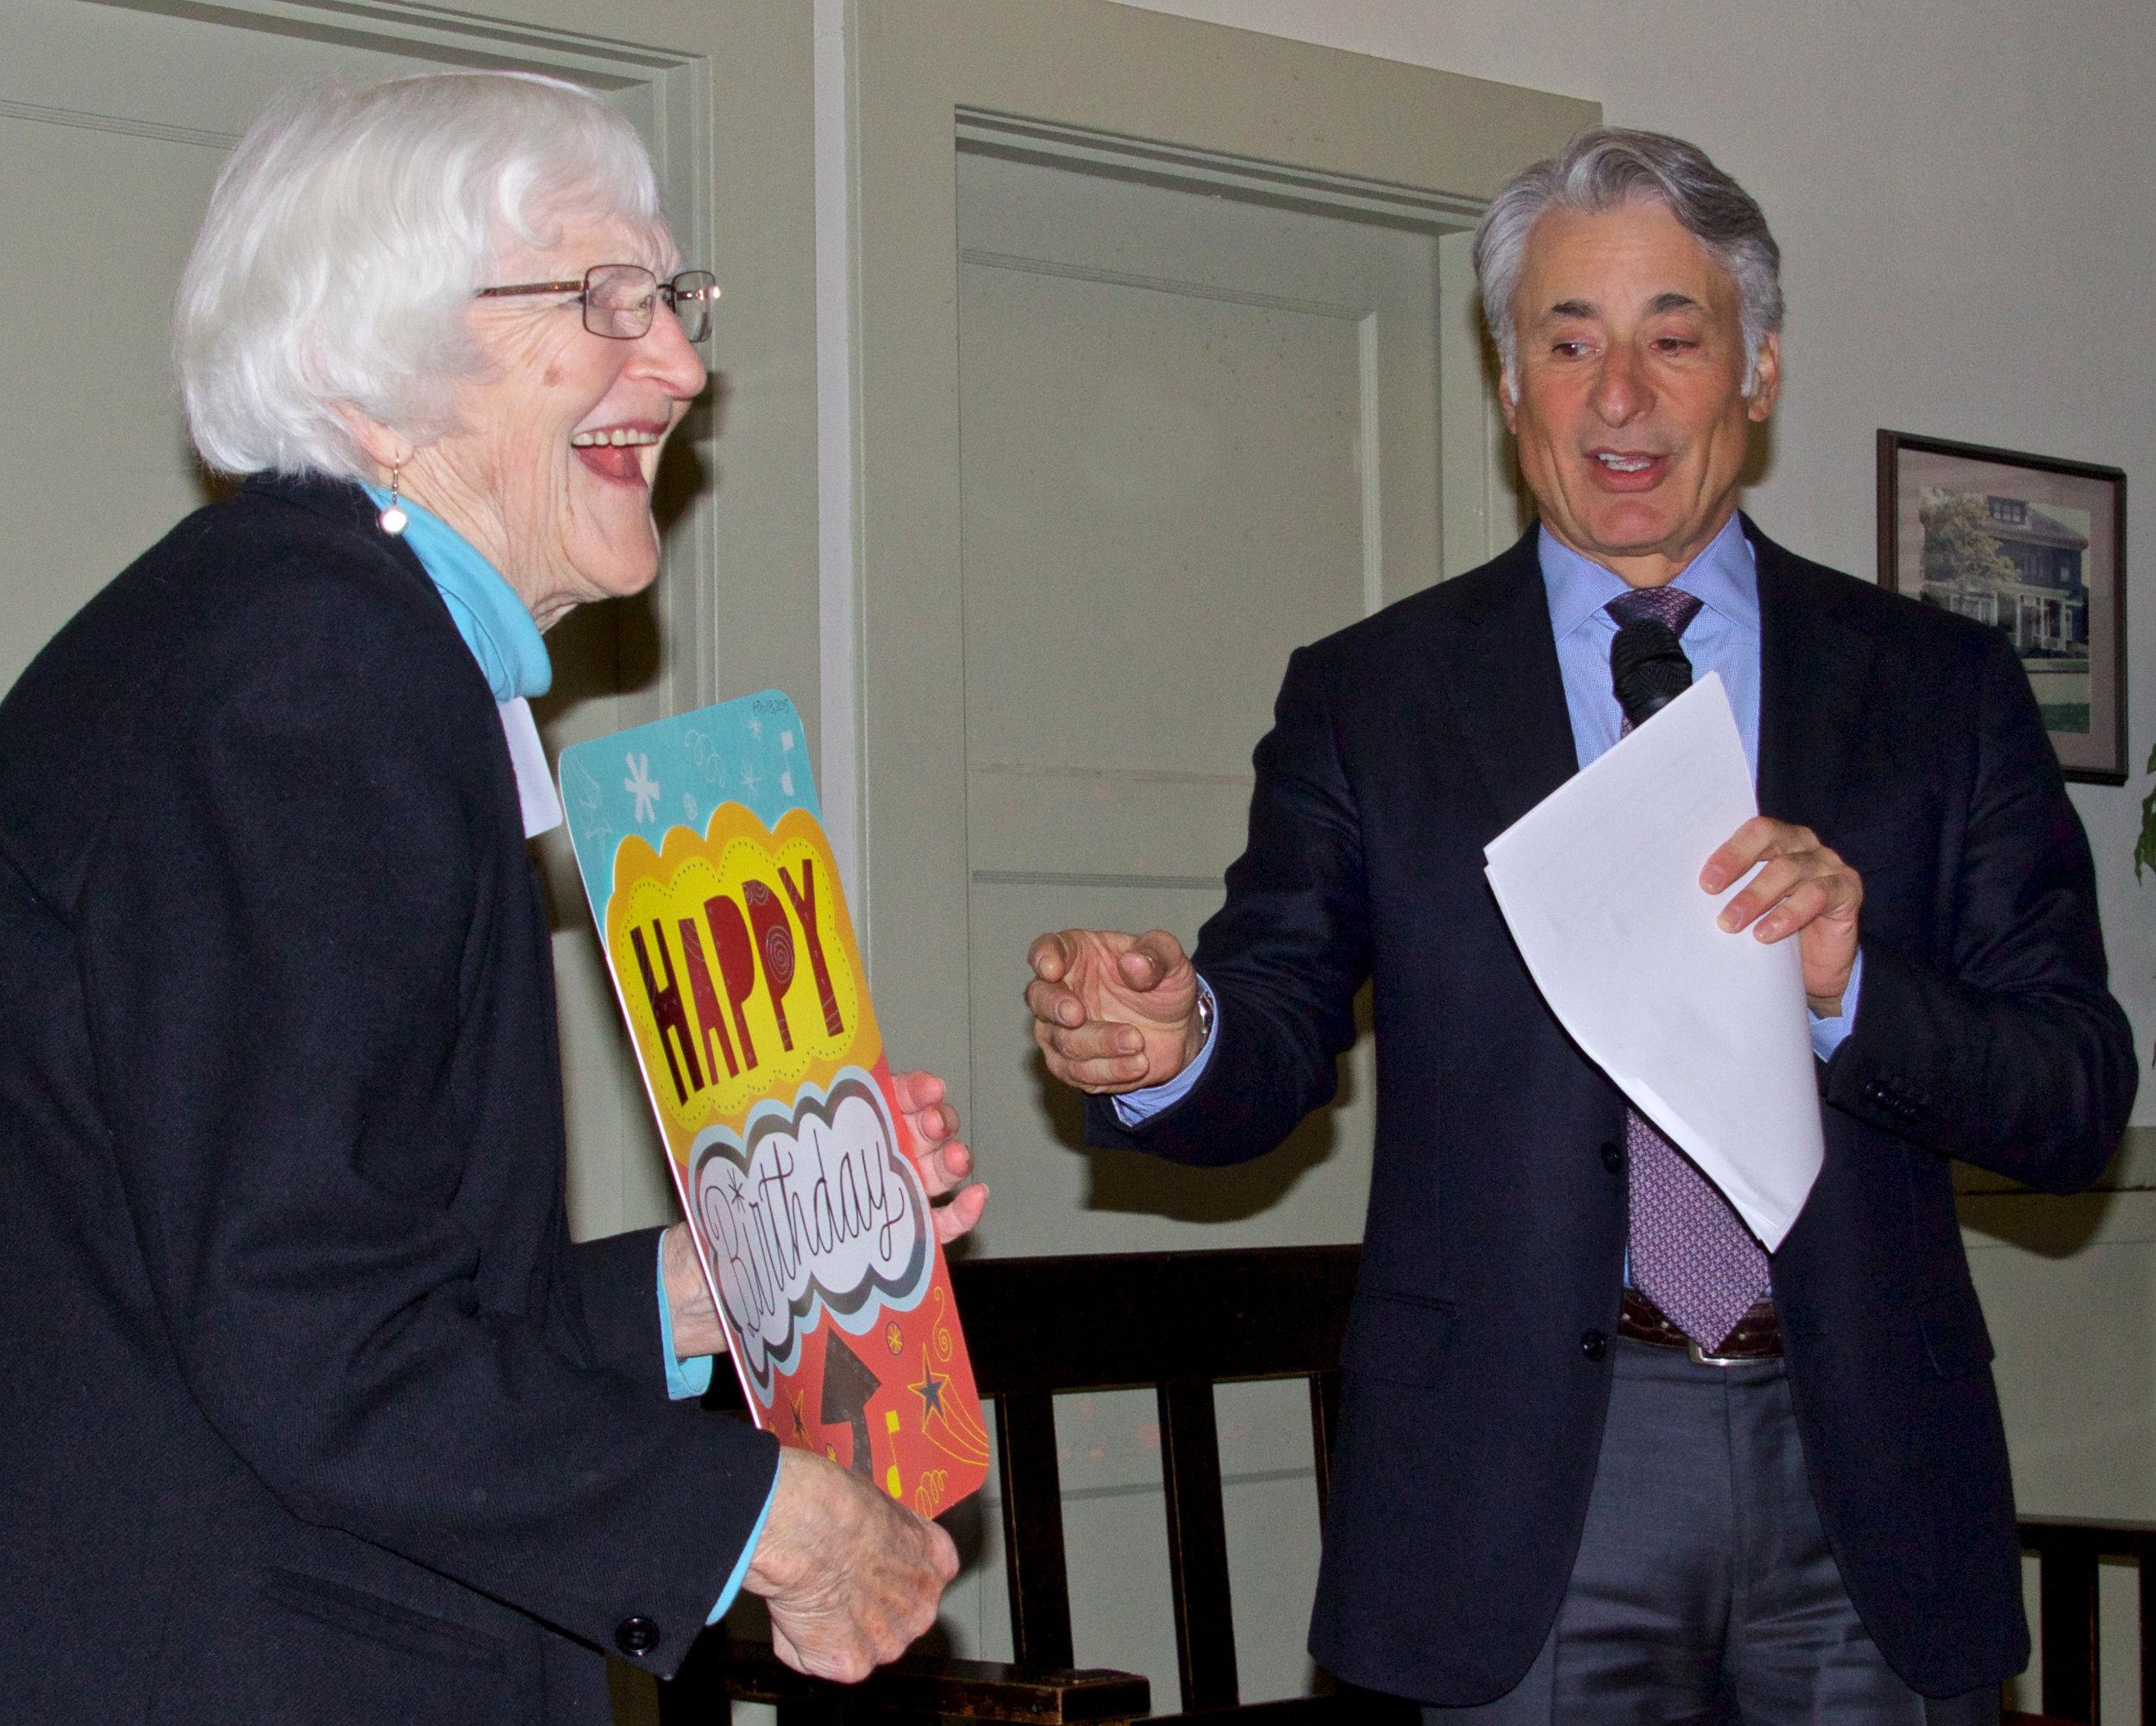 Helen Engle & David Yarnold - Photo by Don Willott of Kitsap Audubon Society